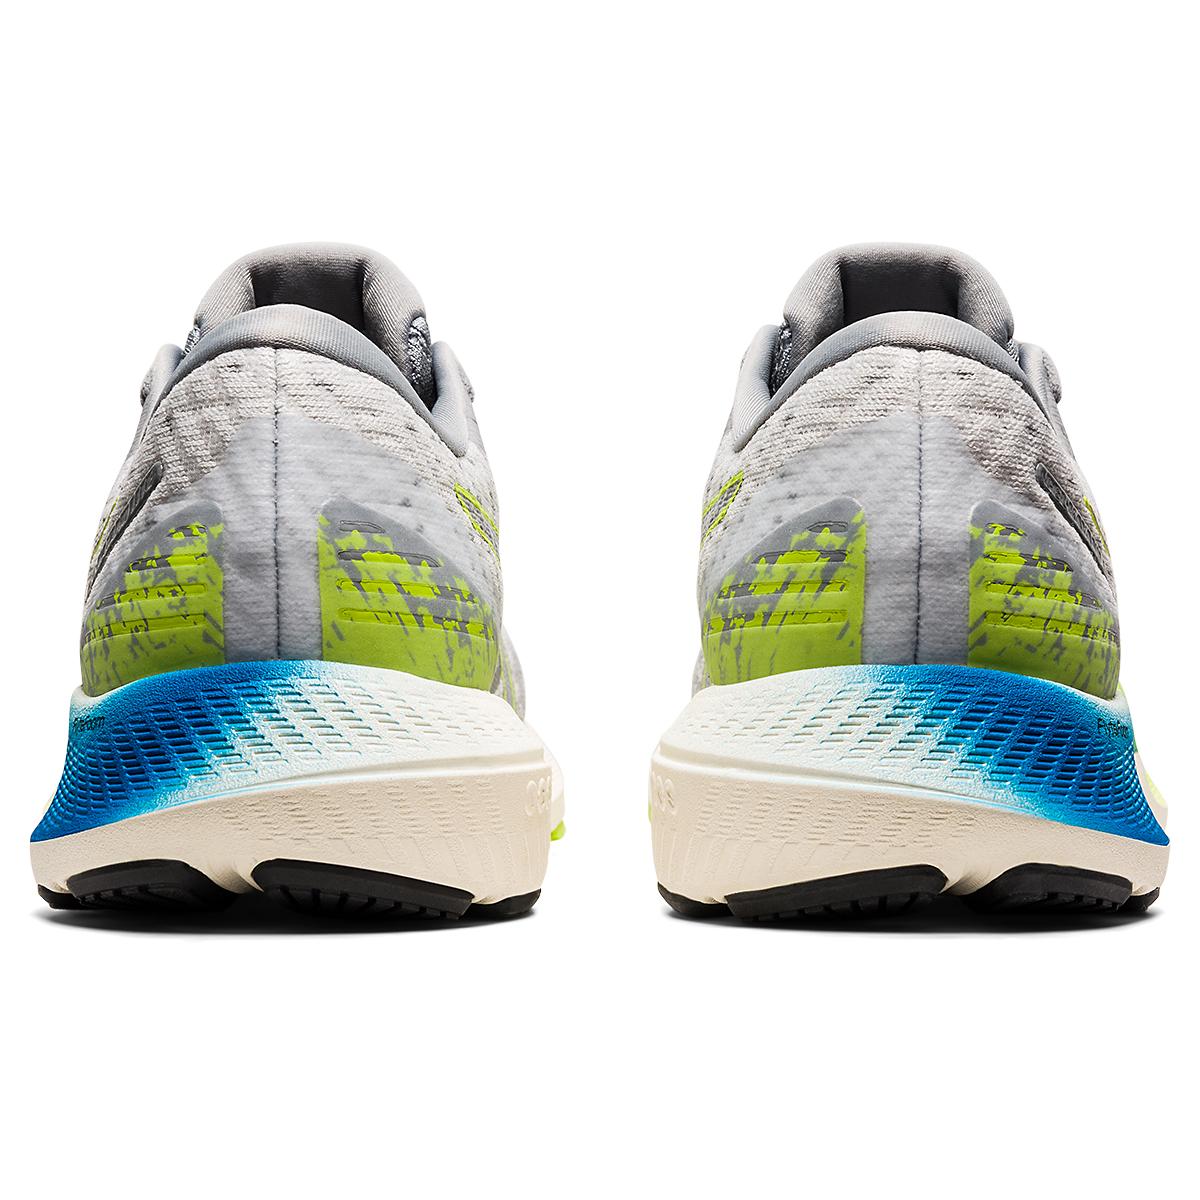 Men's Asics GEL-Kayano Lite Running Shoe - Color: Piedmont Grey/Sheet Rock - Size: 13 - Width: Regular, Piedmont Grey/Sheet Rock, large, image 6